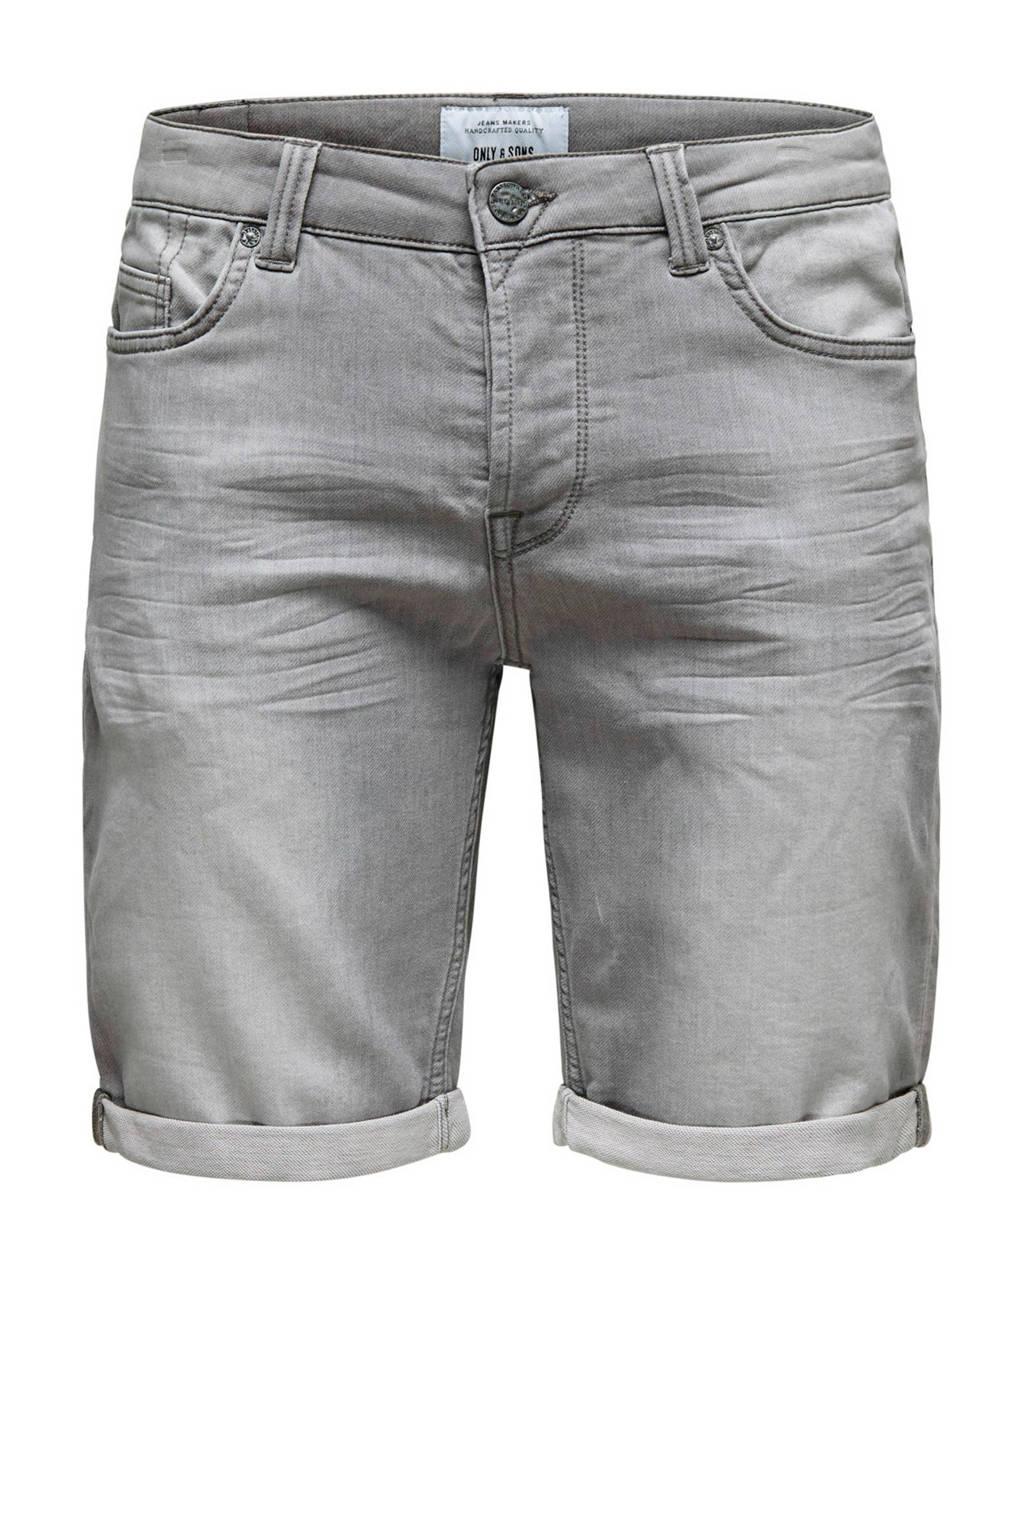 Only & Sons slim fit jeans short, Grey denim